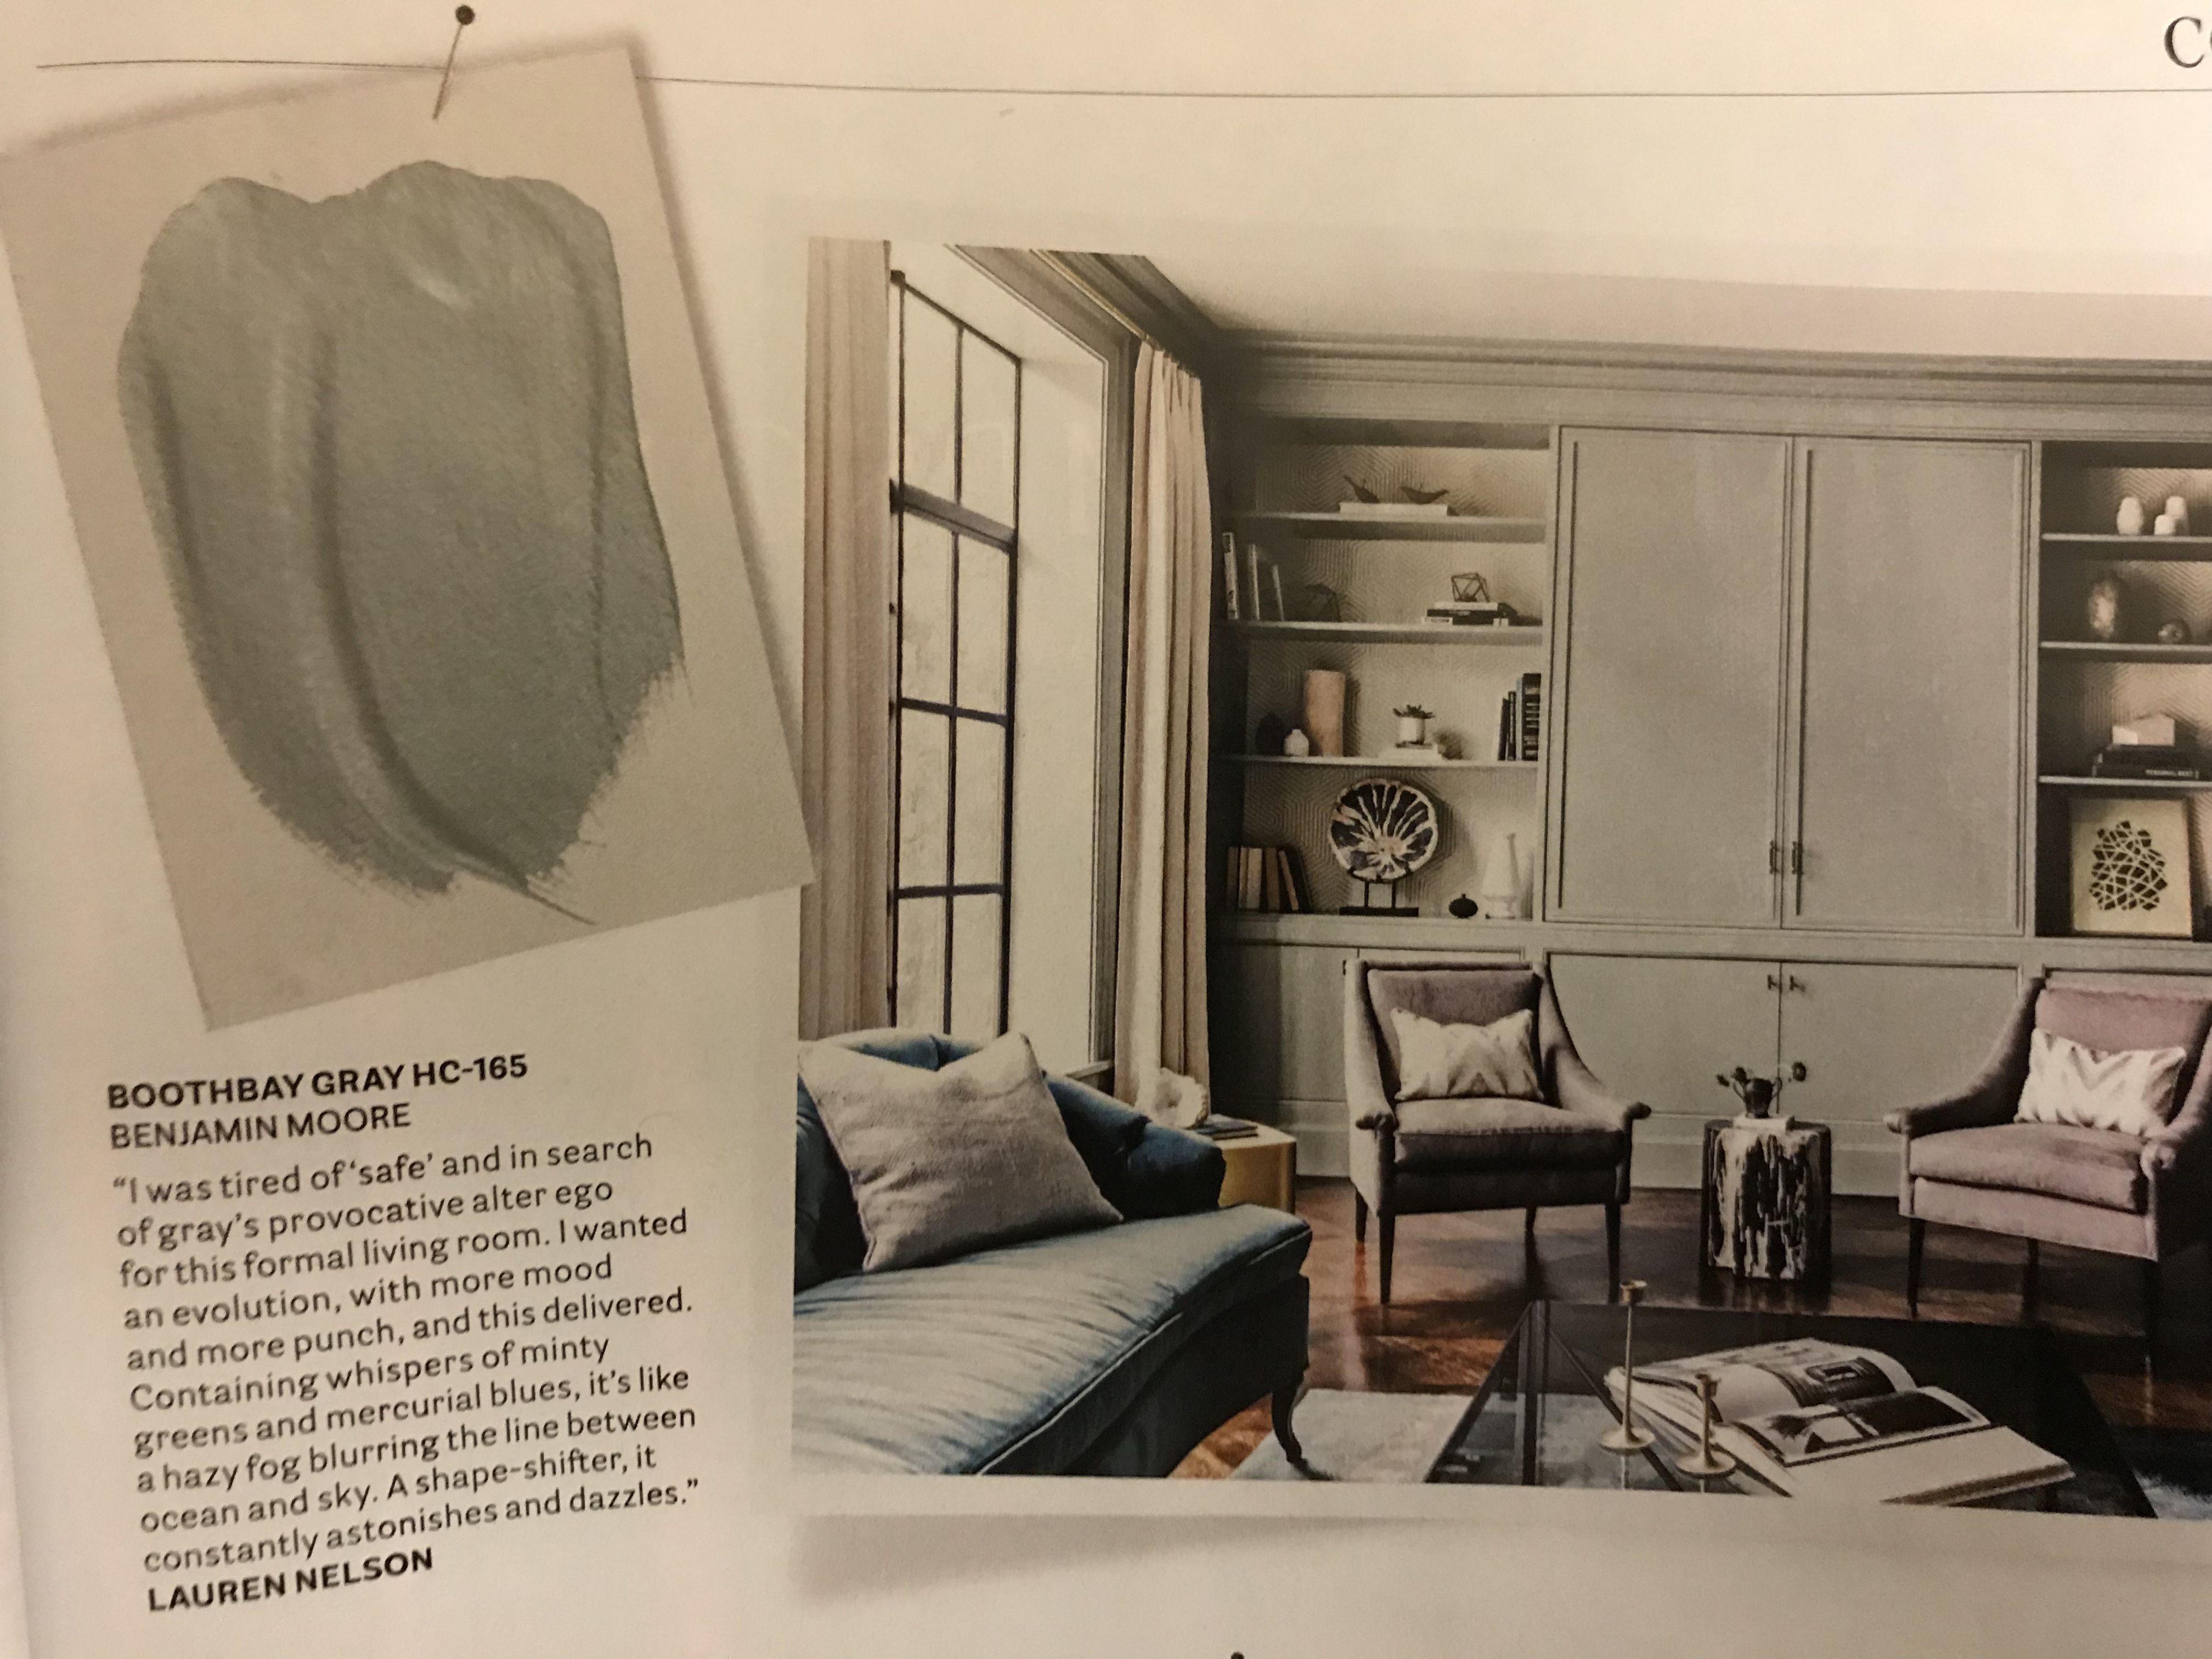 boothbay gray hc165 benjamin moore lauren nelson chameleon gray kitchen cabinet inspiration house beautiful november color inspiration